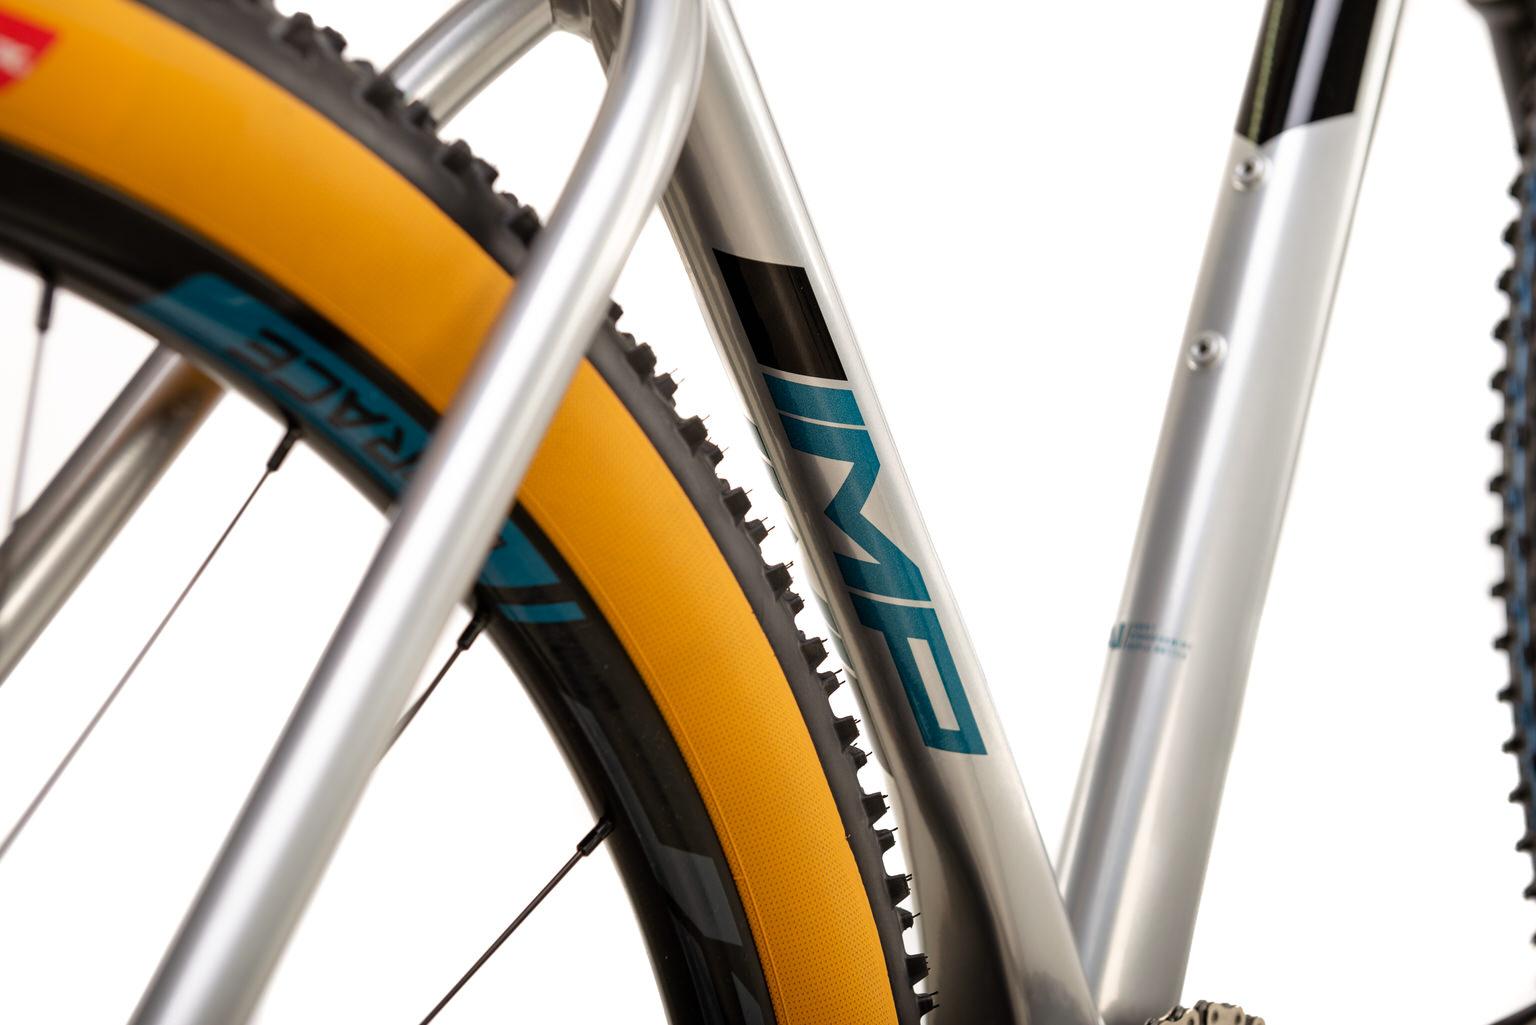 Bicicleta Sense Impact Race Aro 29 12V - 2021/22 - Prata e Azul